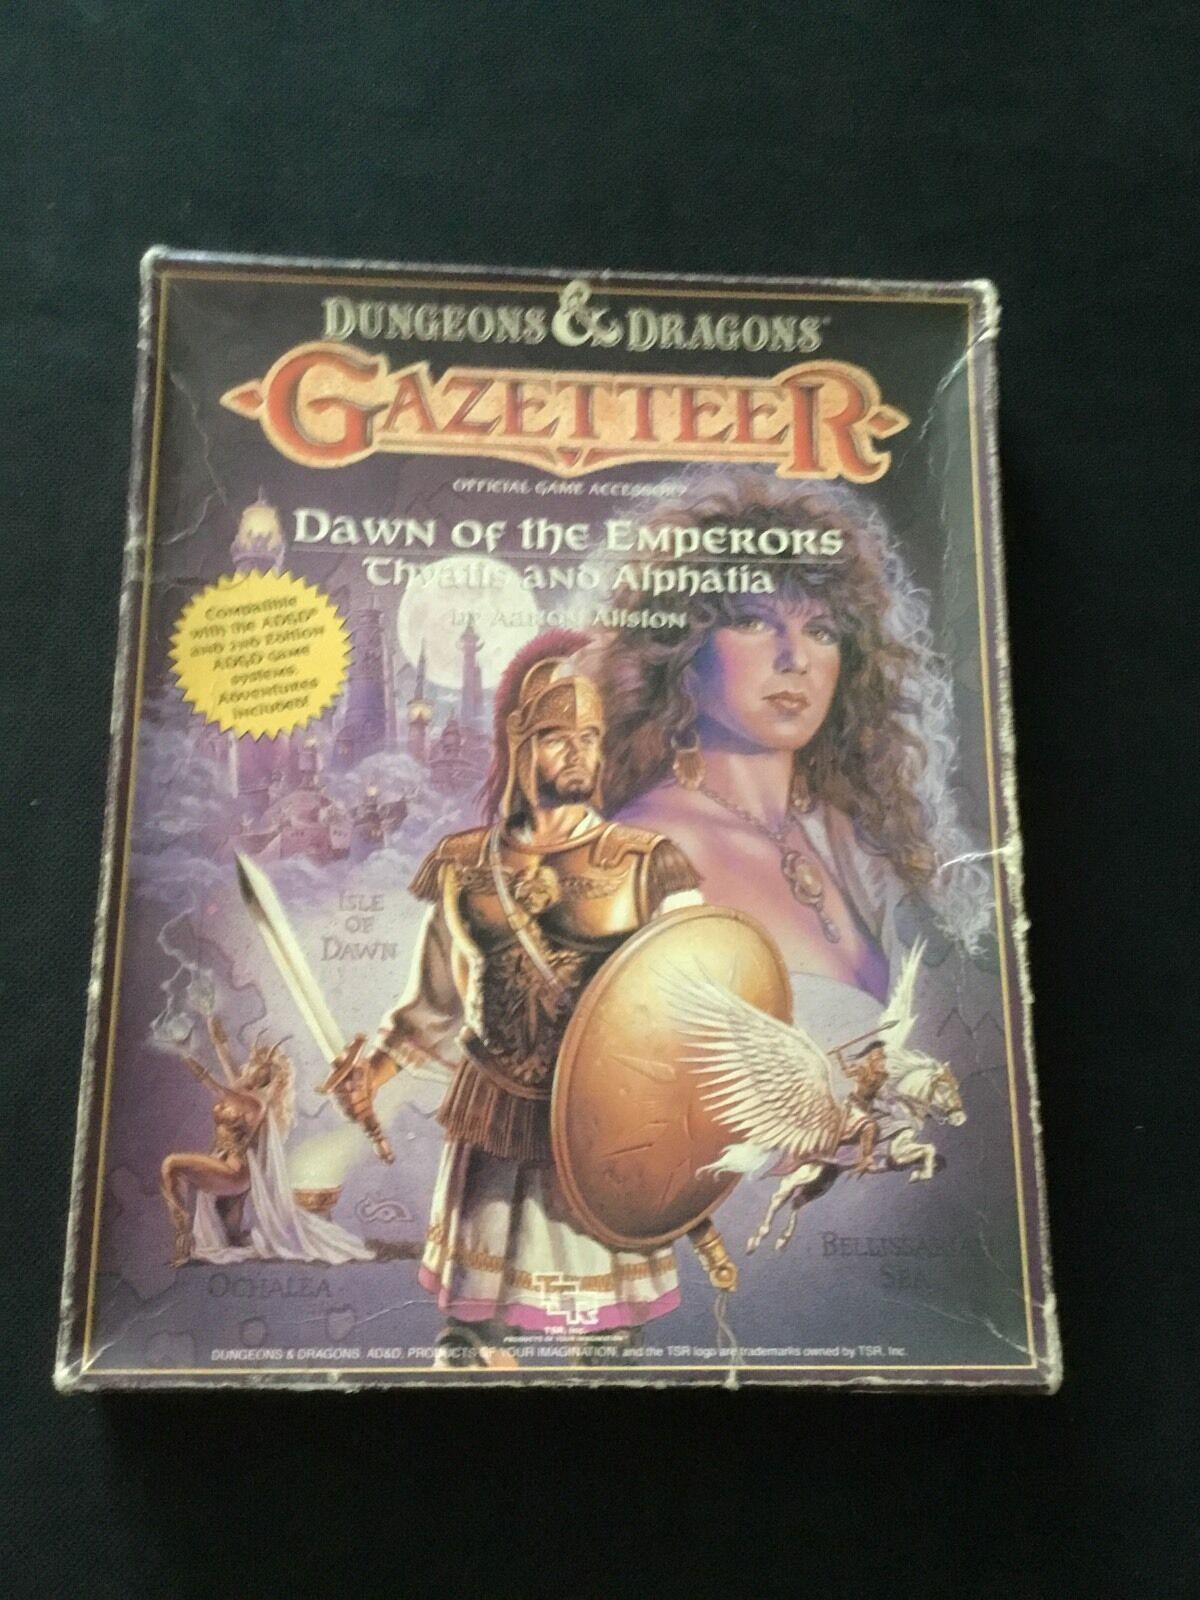 Dungeons &  Dragons - Myestrellaa Gazeteer- Dawn Of The Emperors Thyatis e Alphatia  rivenditore di fitness